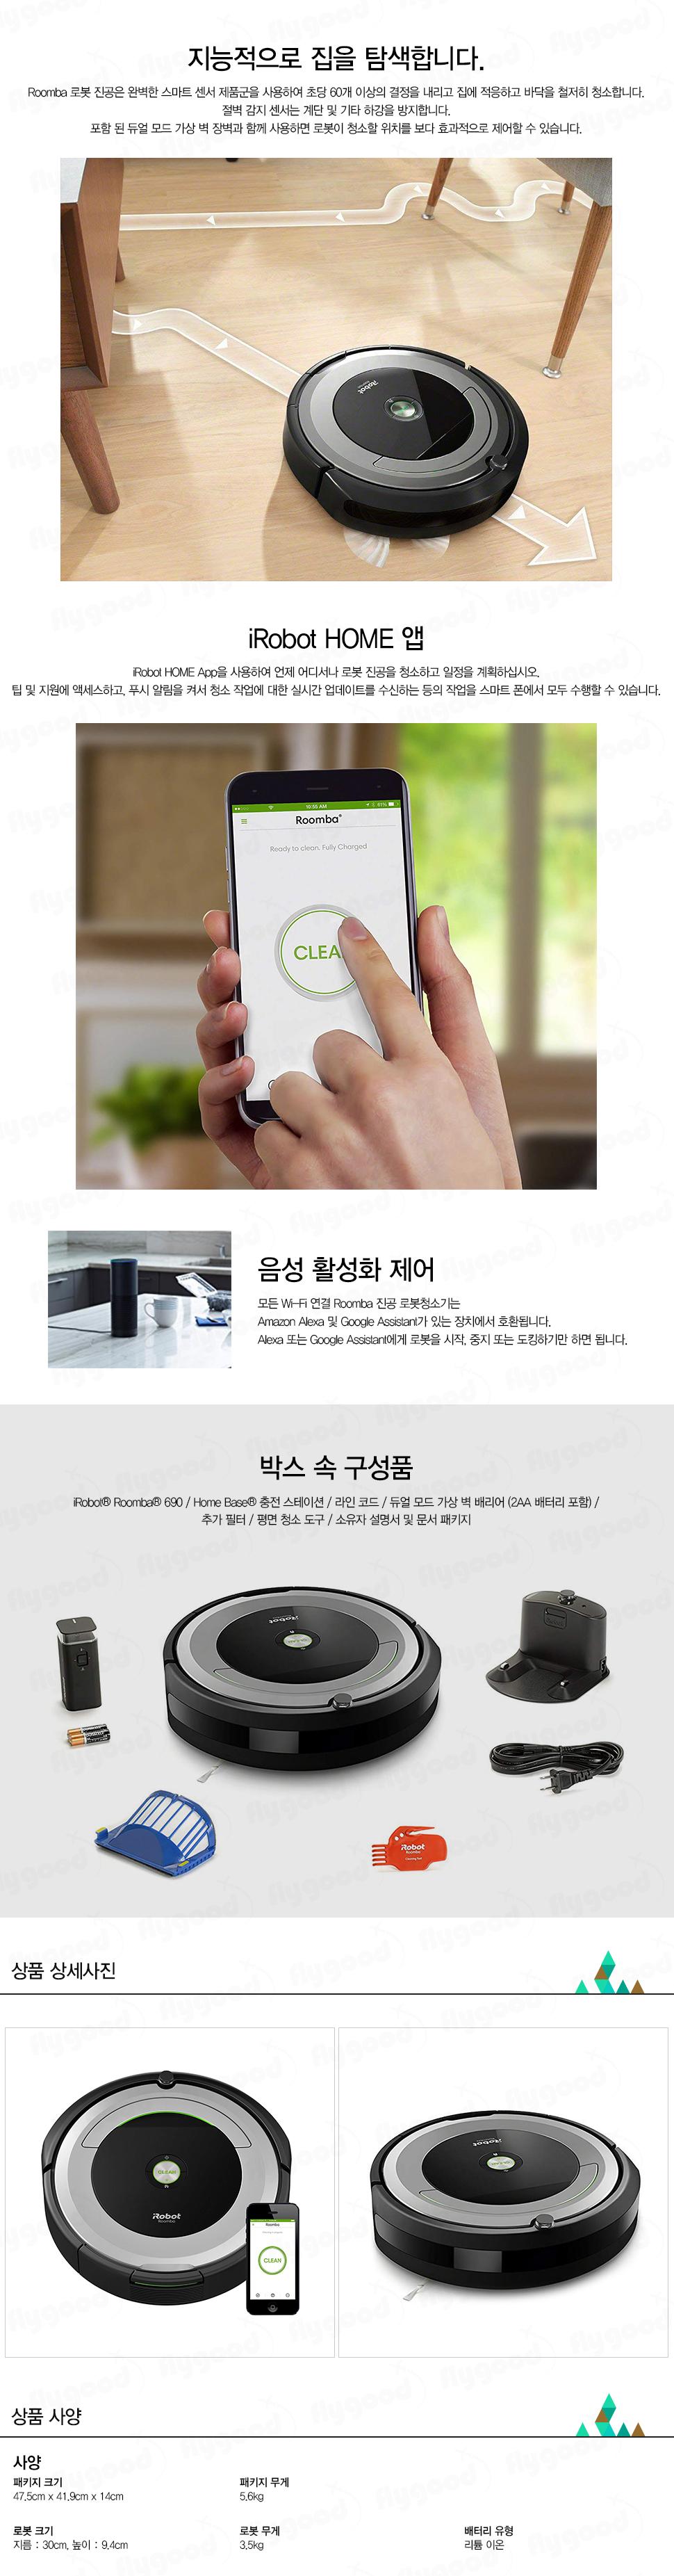 iRobot_Roomba_690_03.jpg